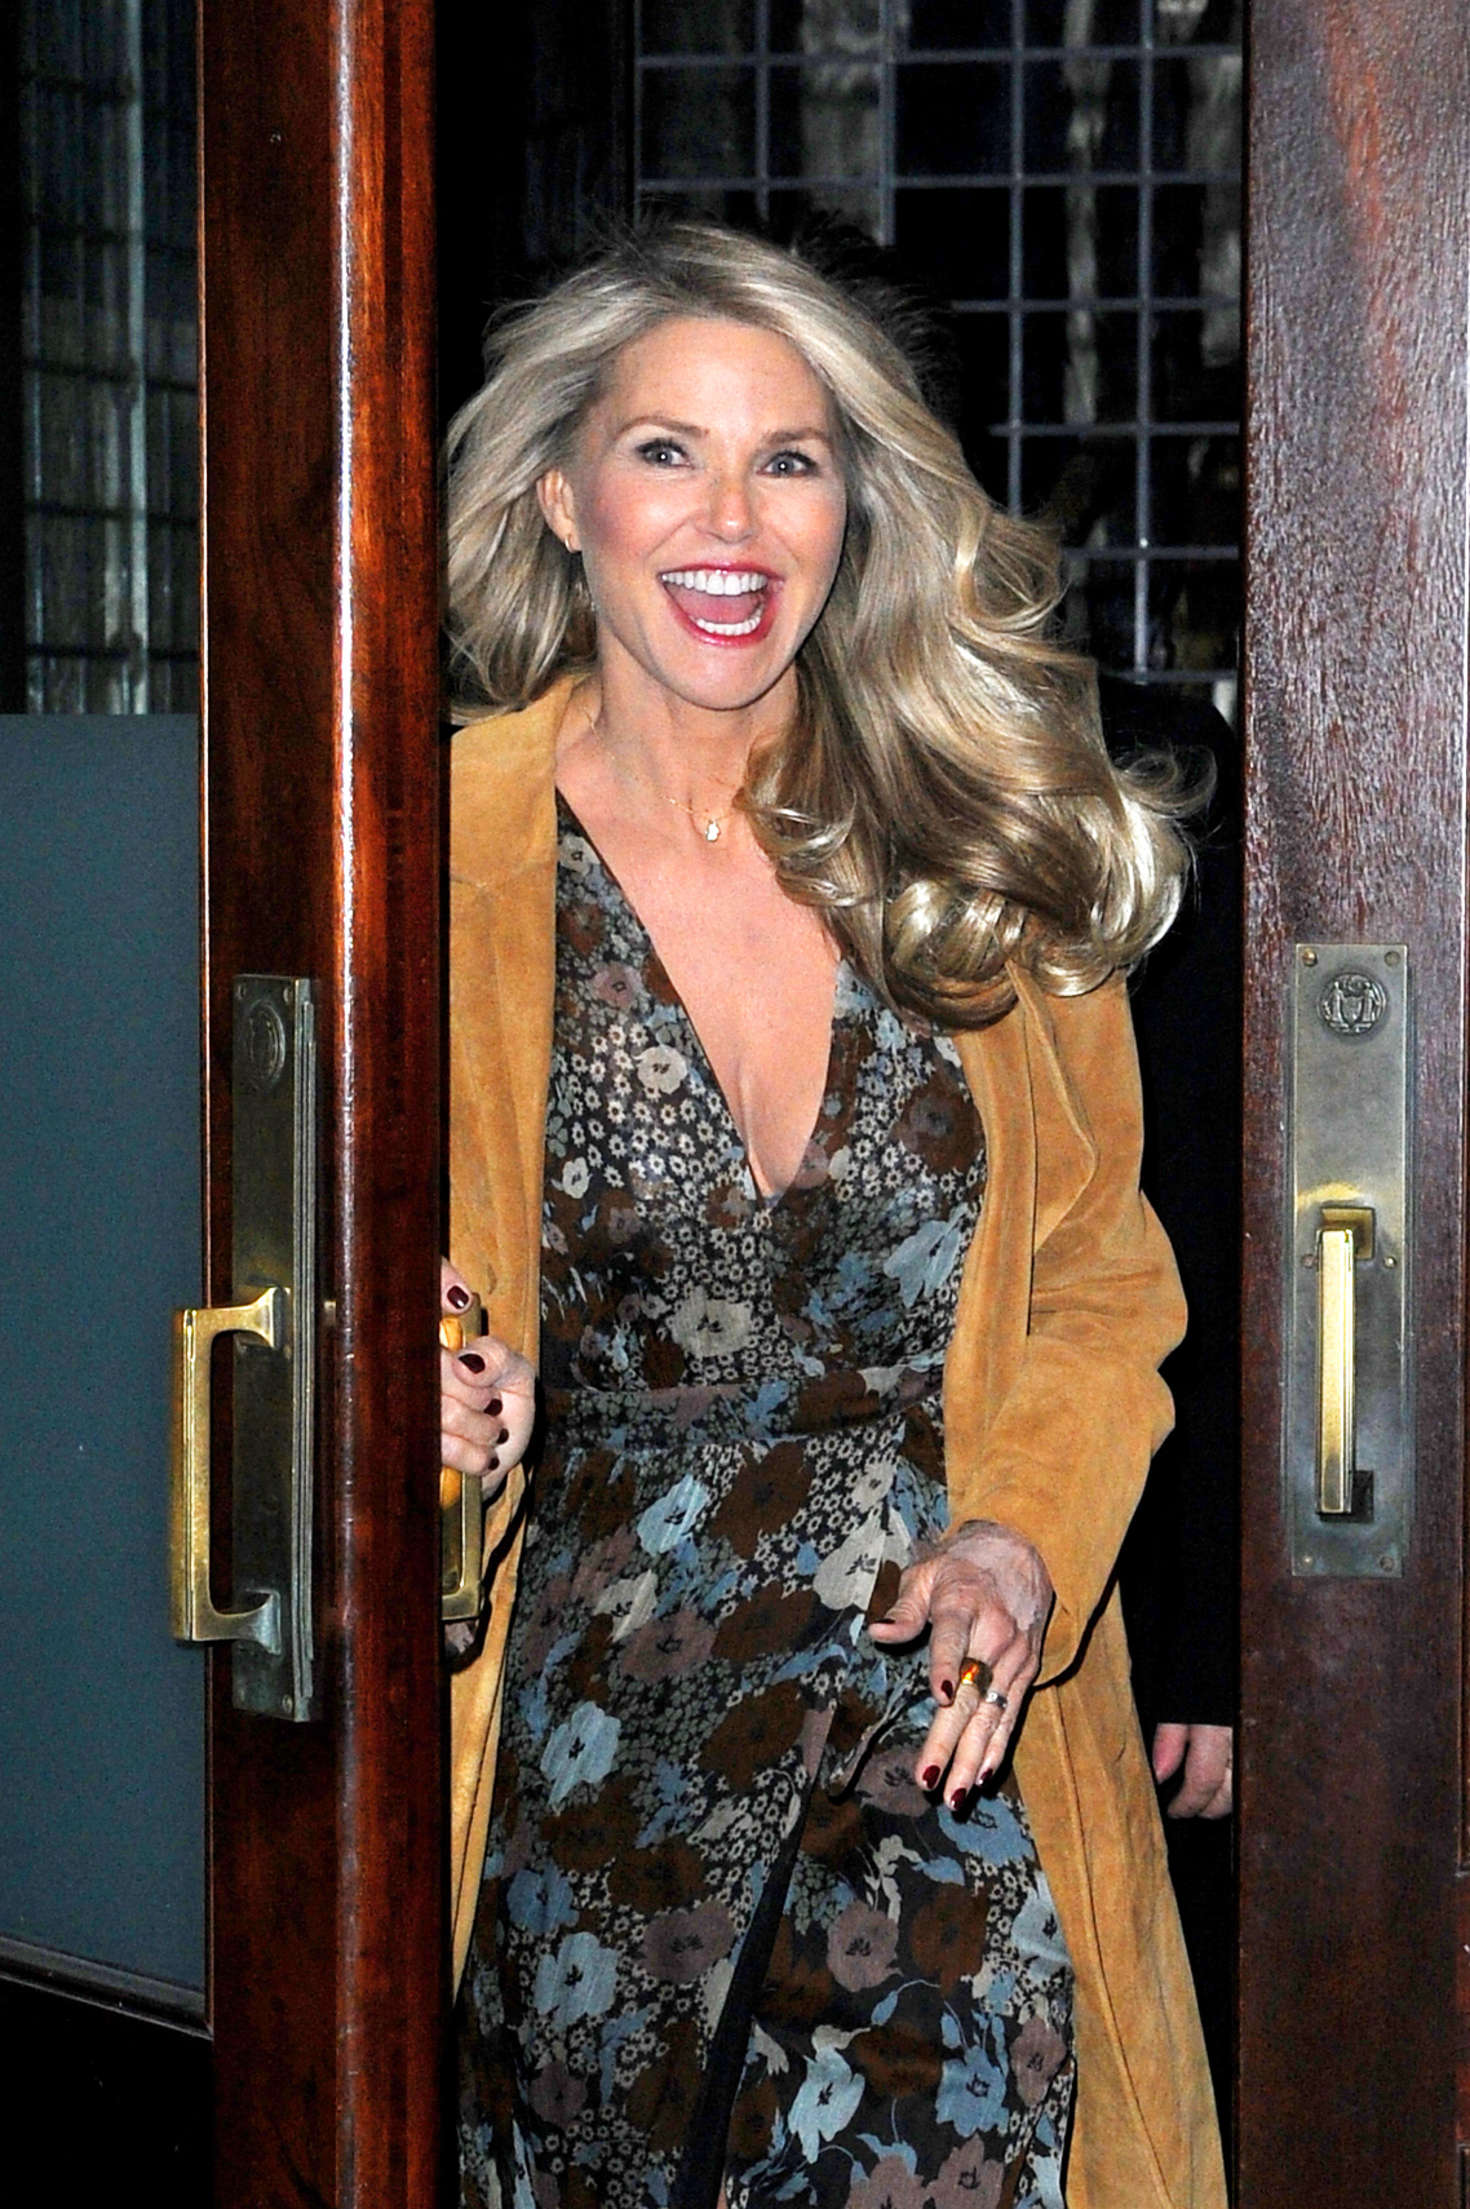 Christie Brinkley Leaves her Tribeca hotel in New York City